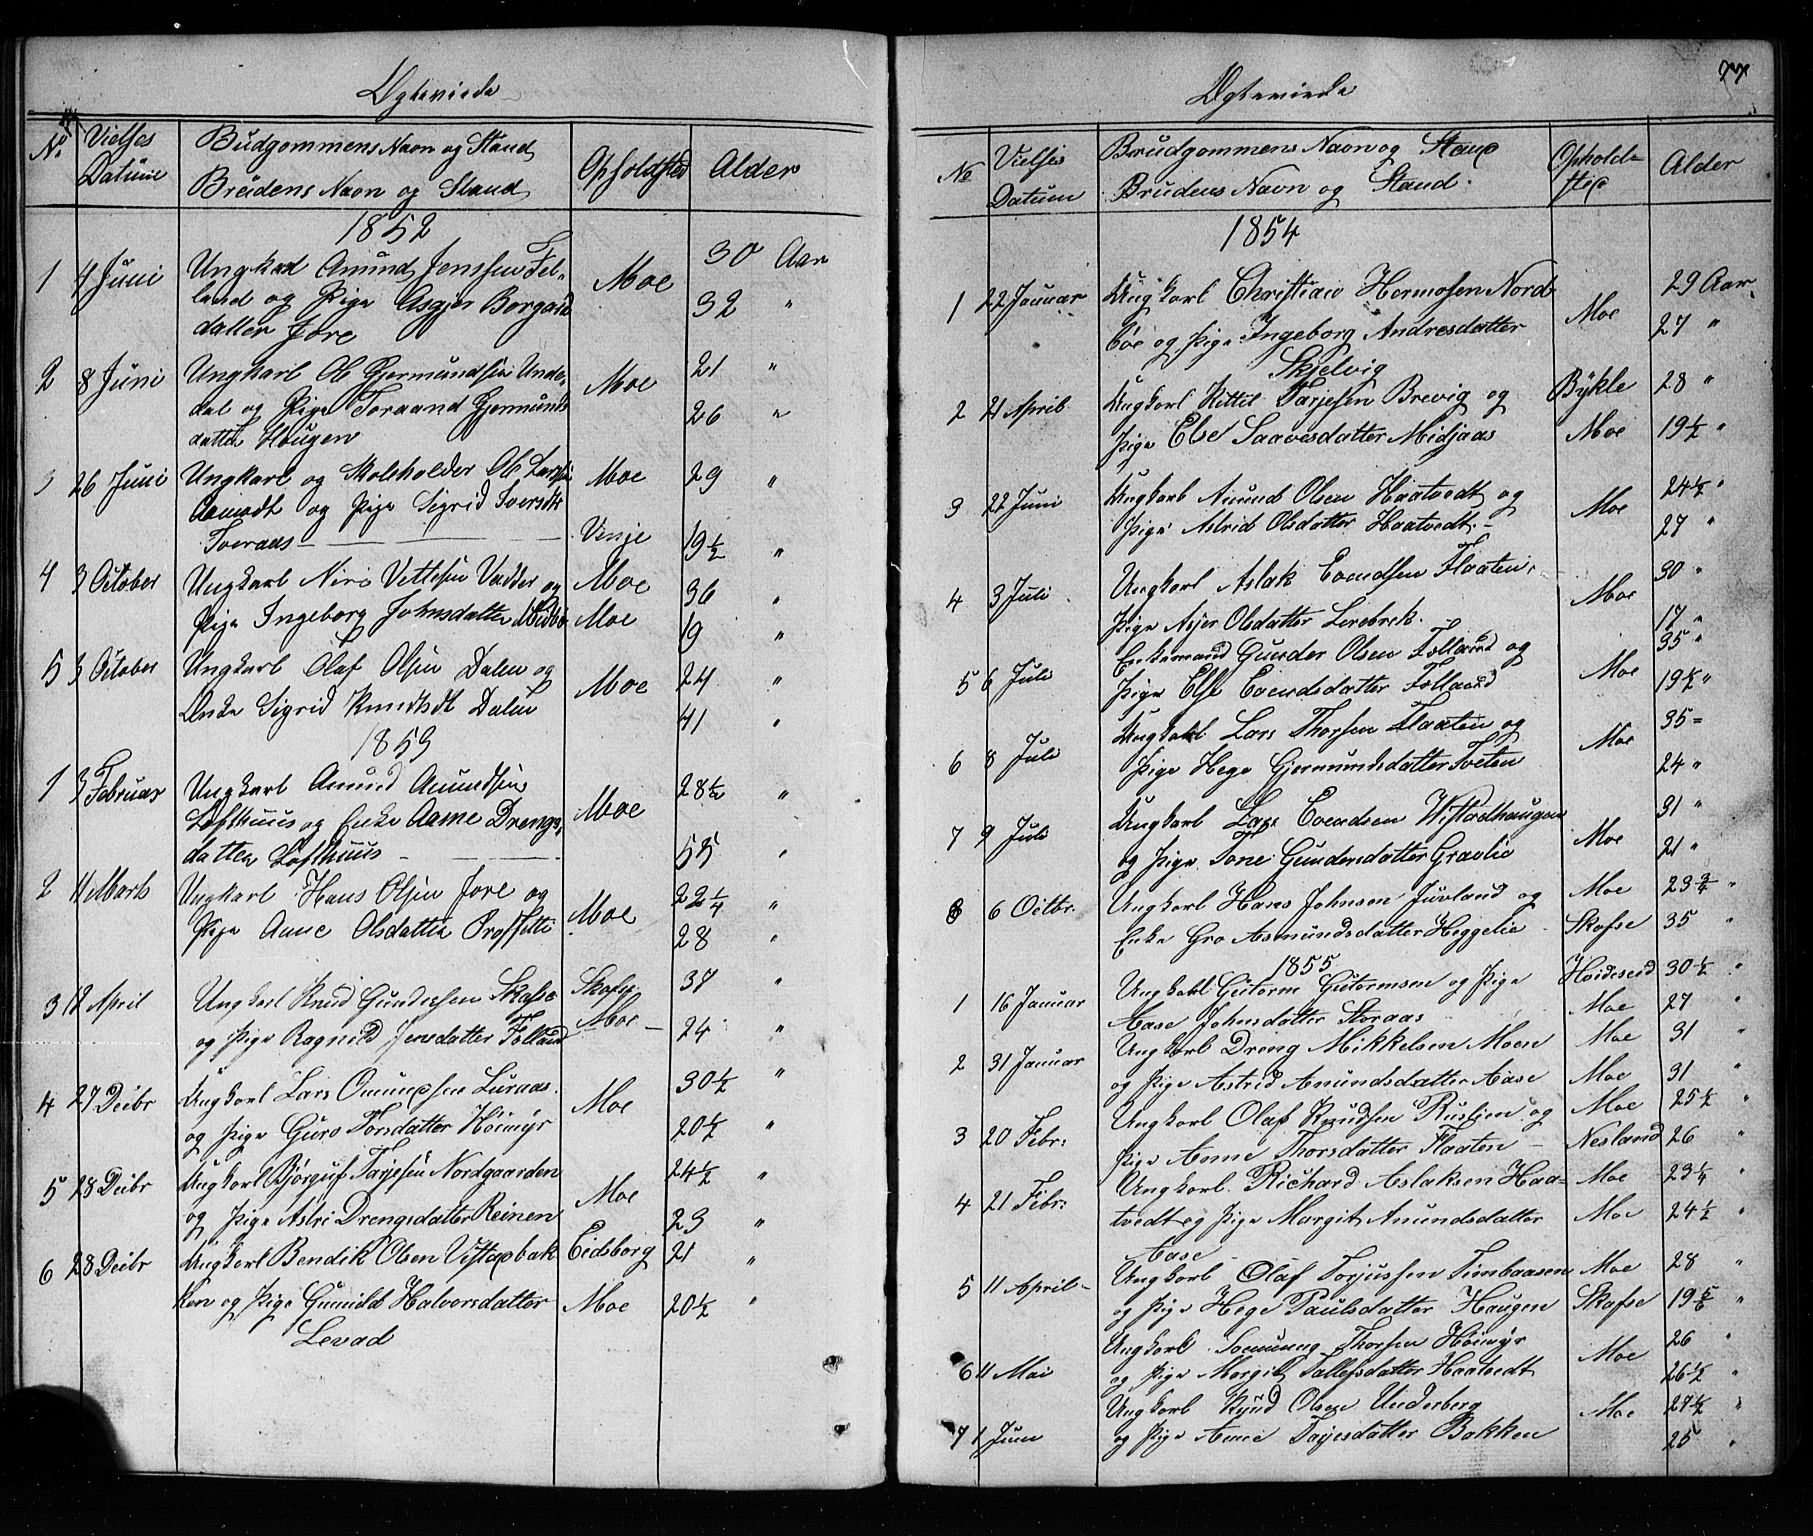 SAKO, Mo kirkebøker, G/Ga/L0001: Klokkerbok nr. I 1, 1851-1891, s. 77